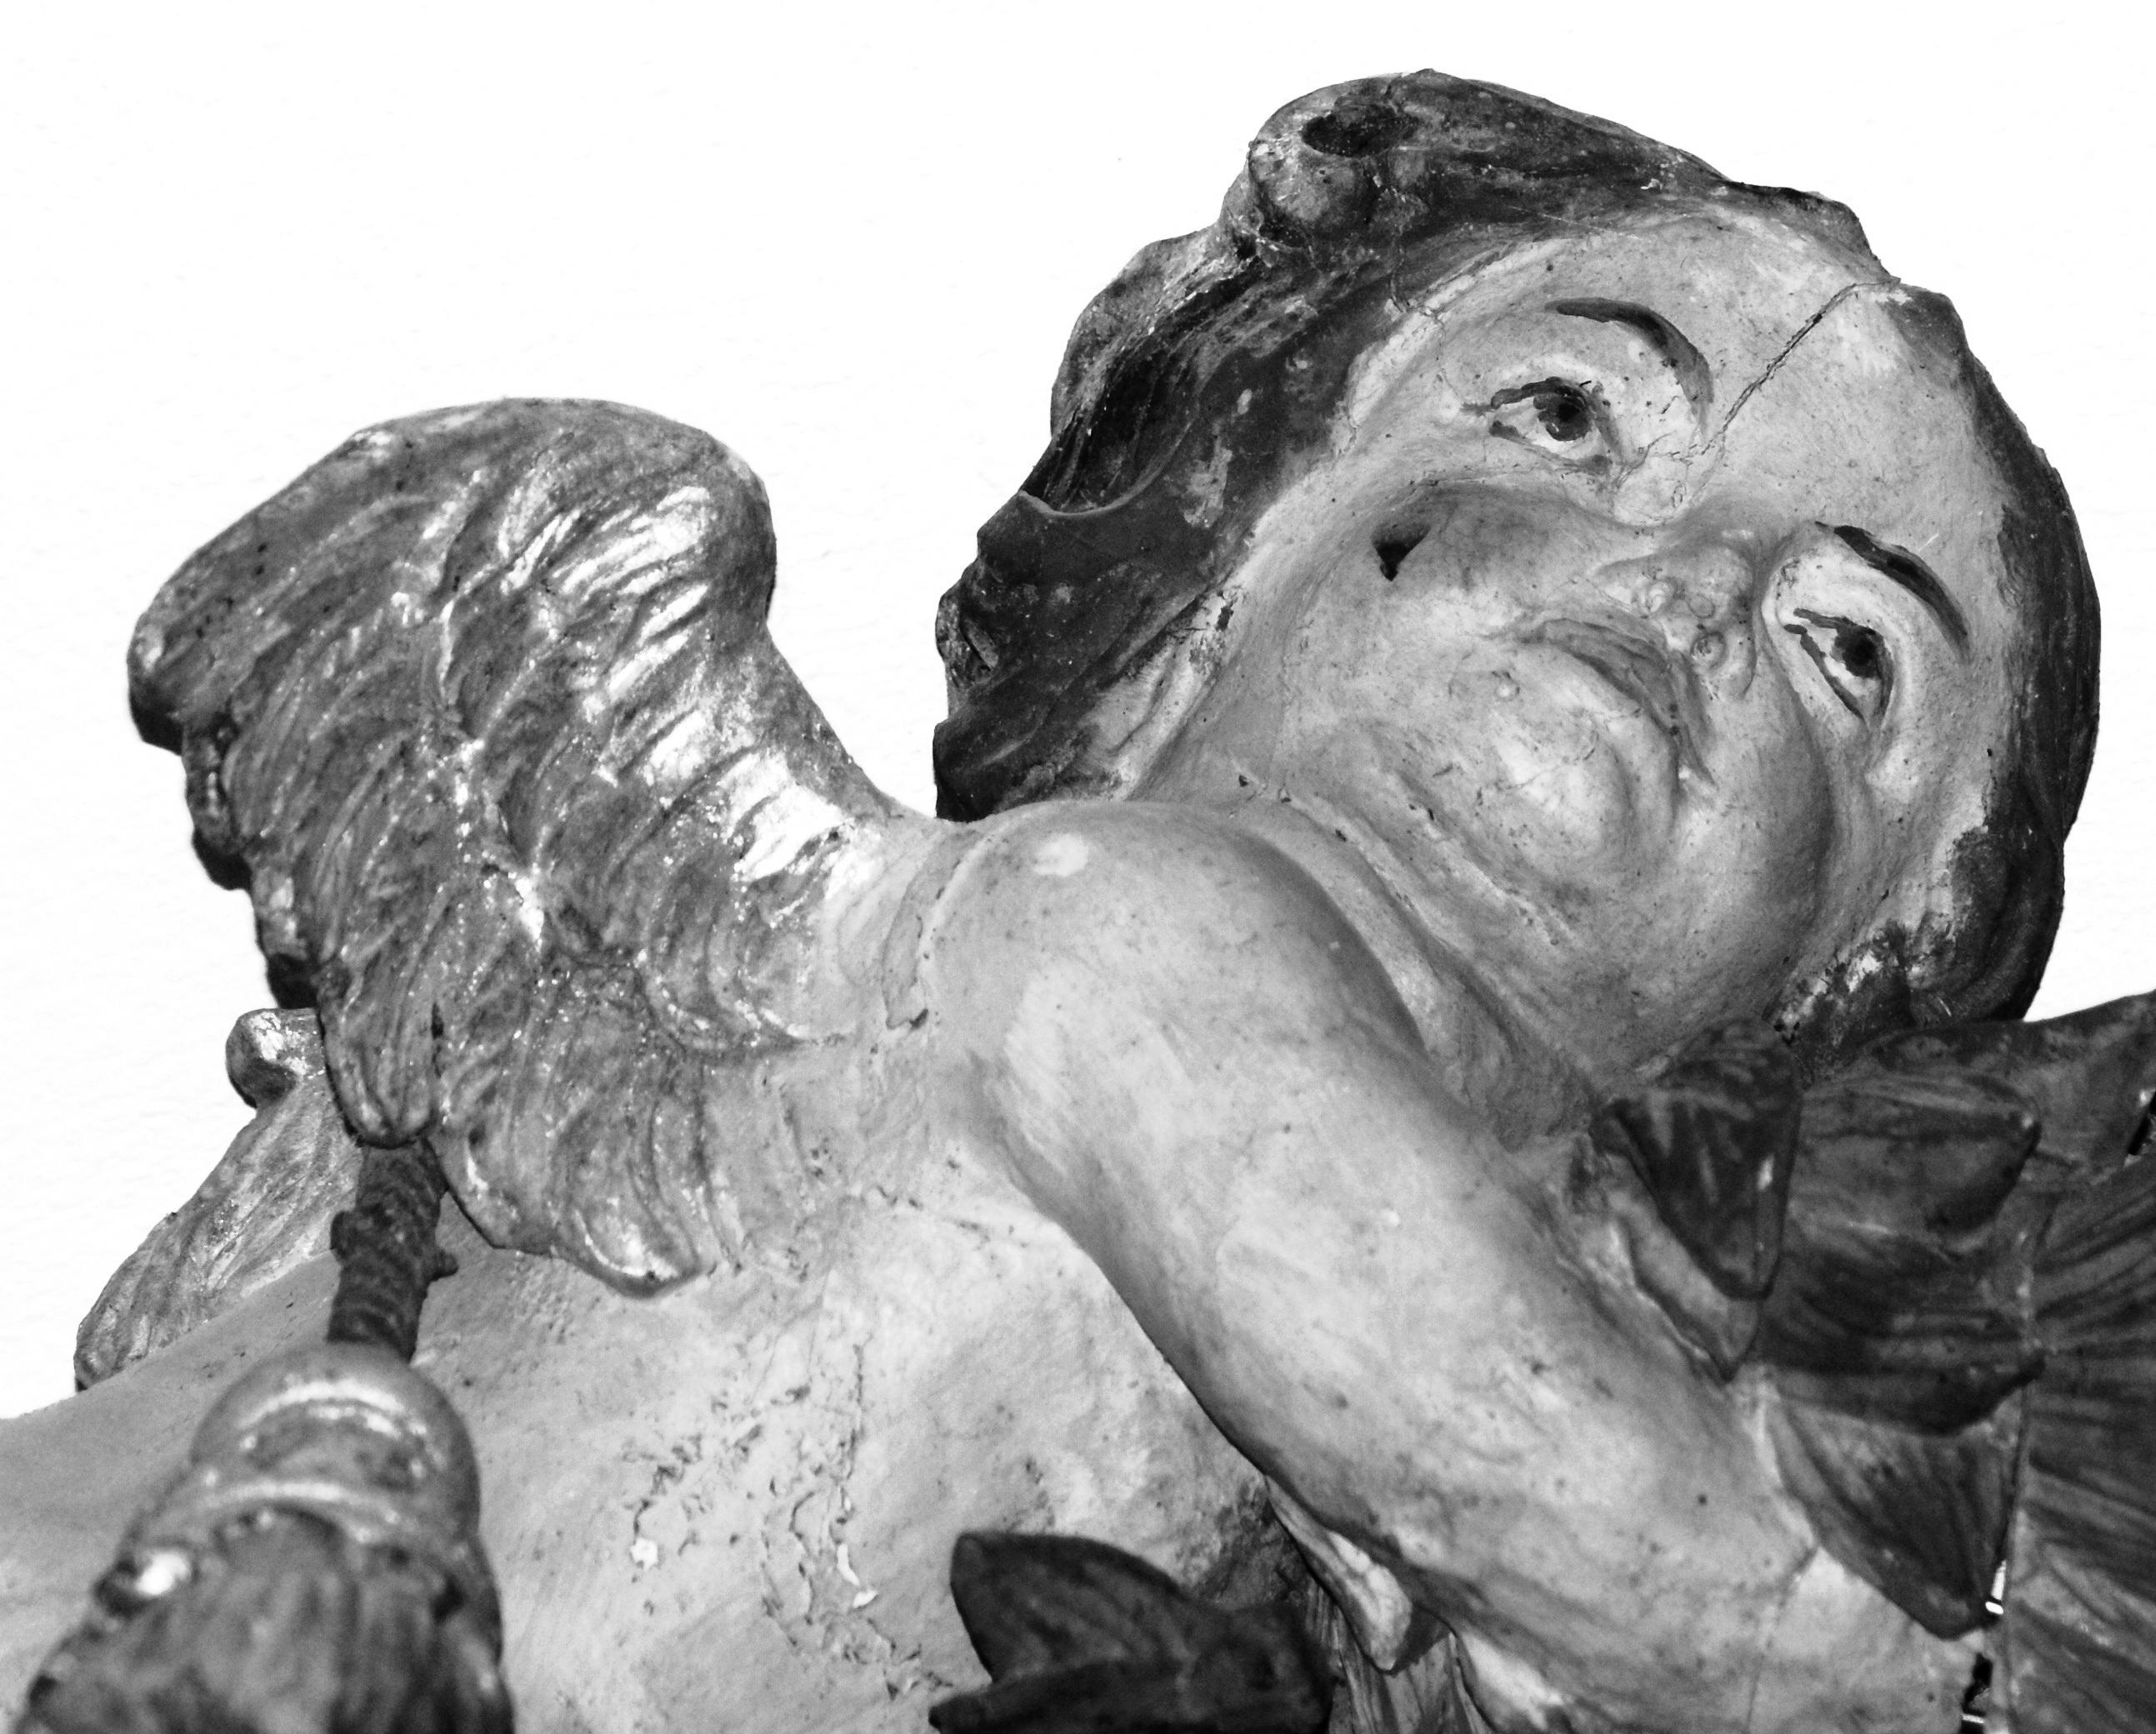 Gambar Hitam Dan Putih Kayu Antik Tua Monumen Patung